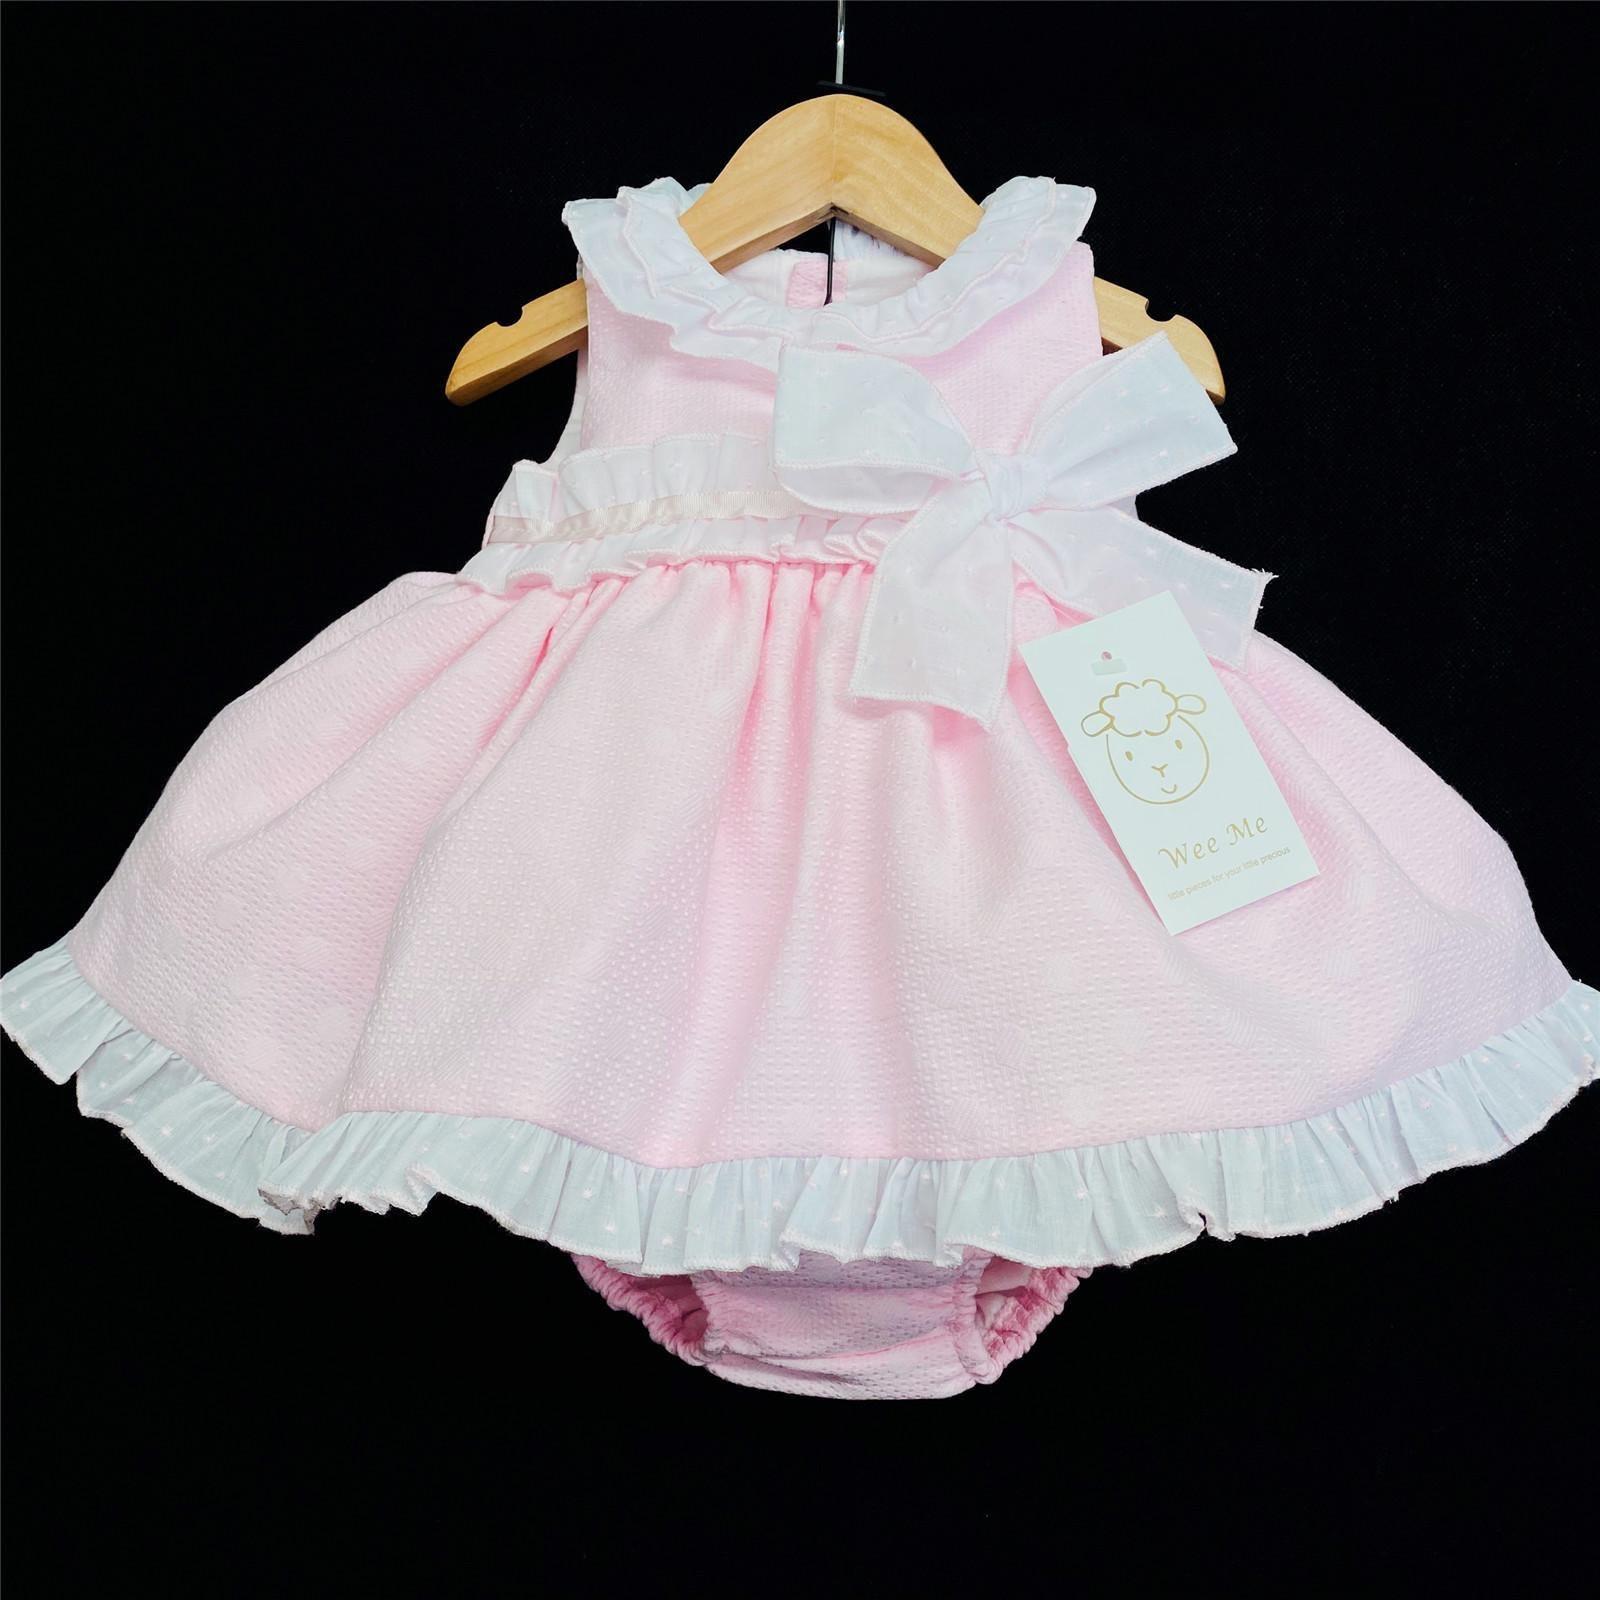 Wee Me Girls Pink Bow Dress MYD46